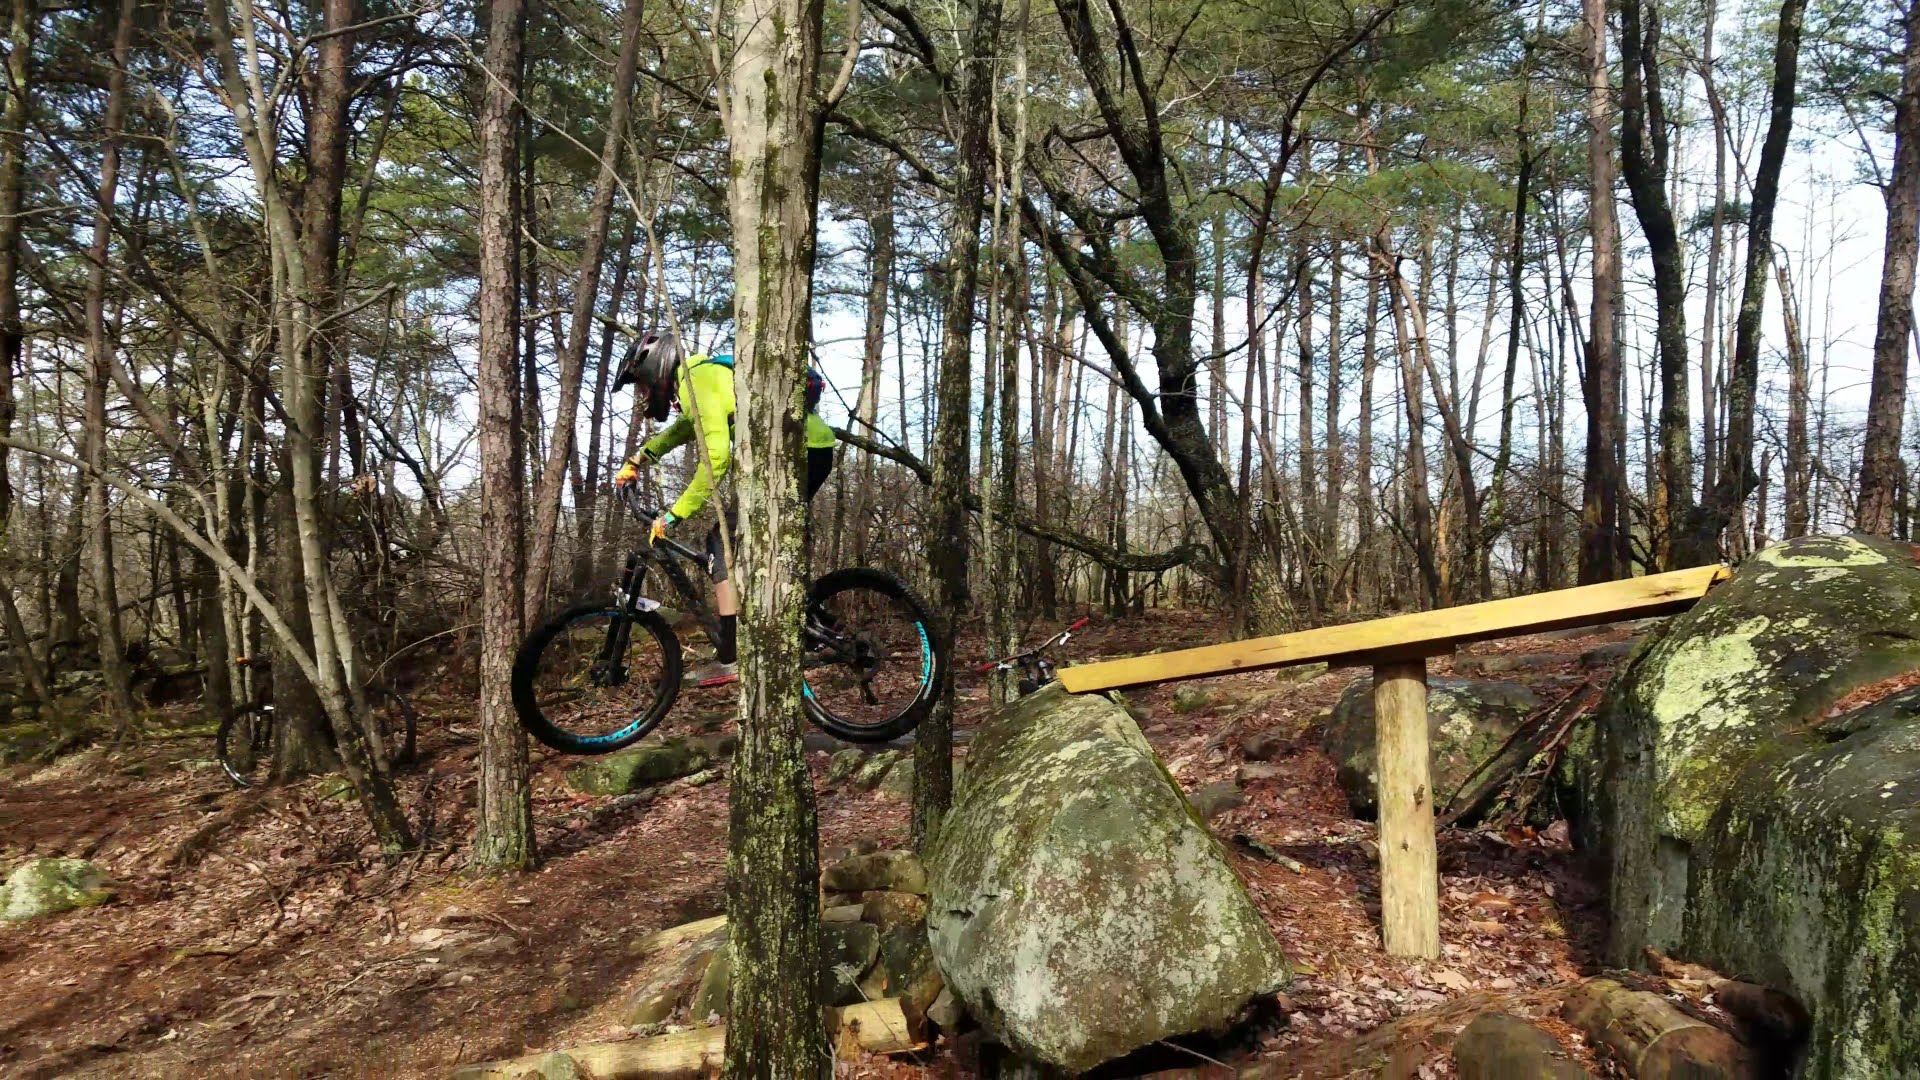 BUMP ride at Racoon Mountain